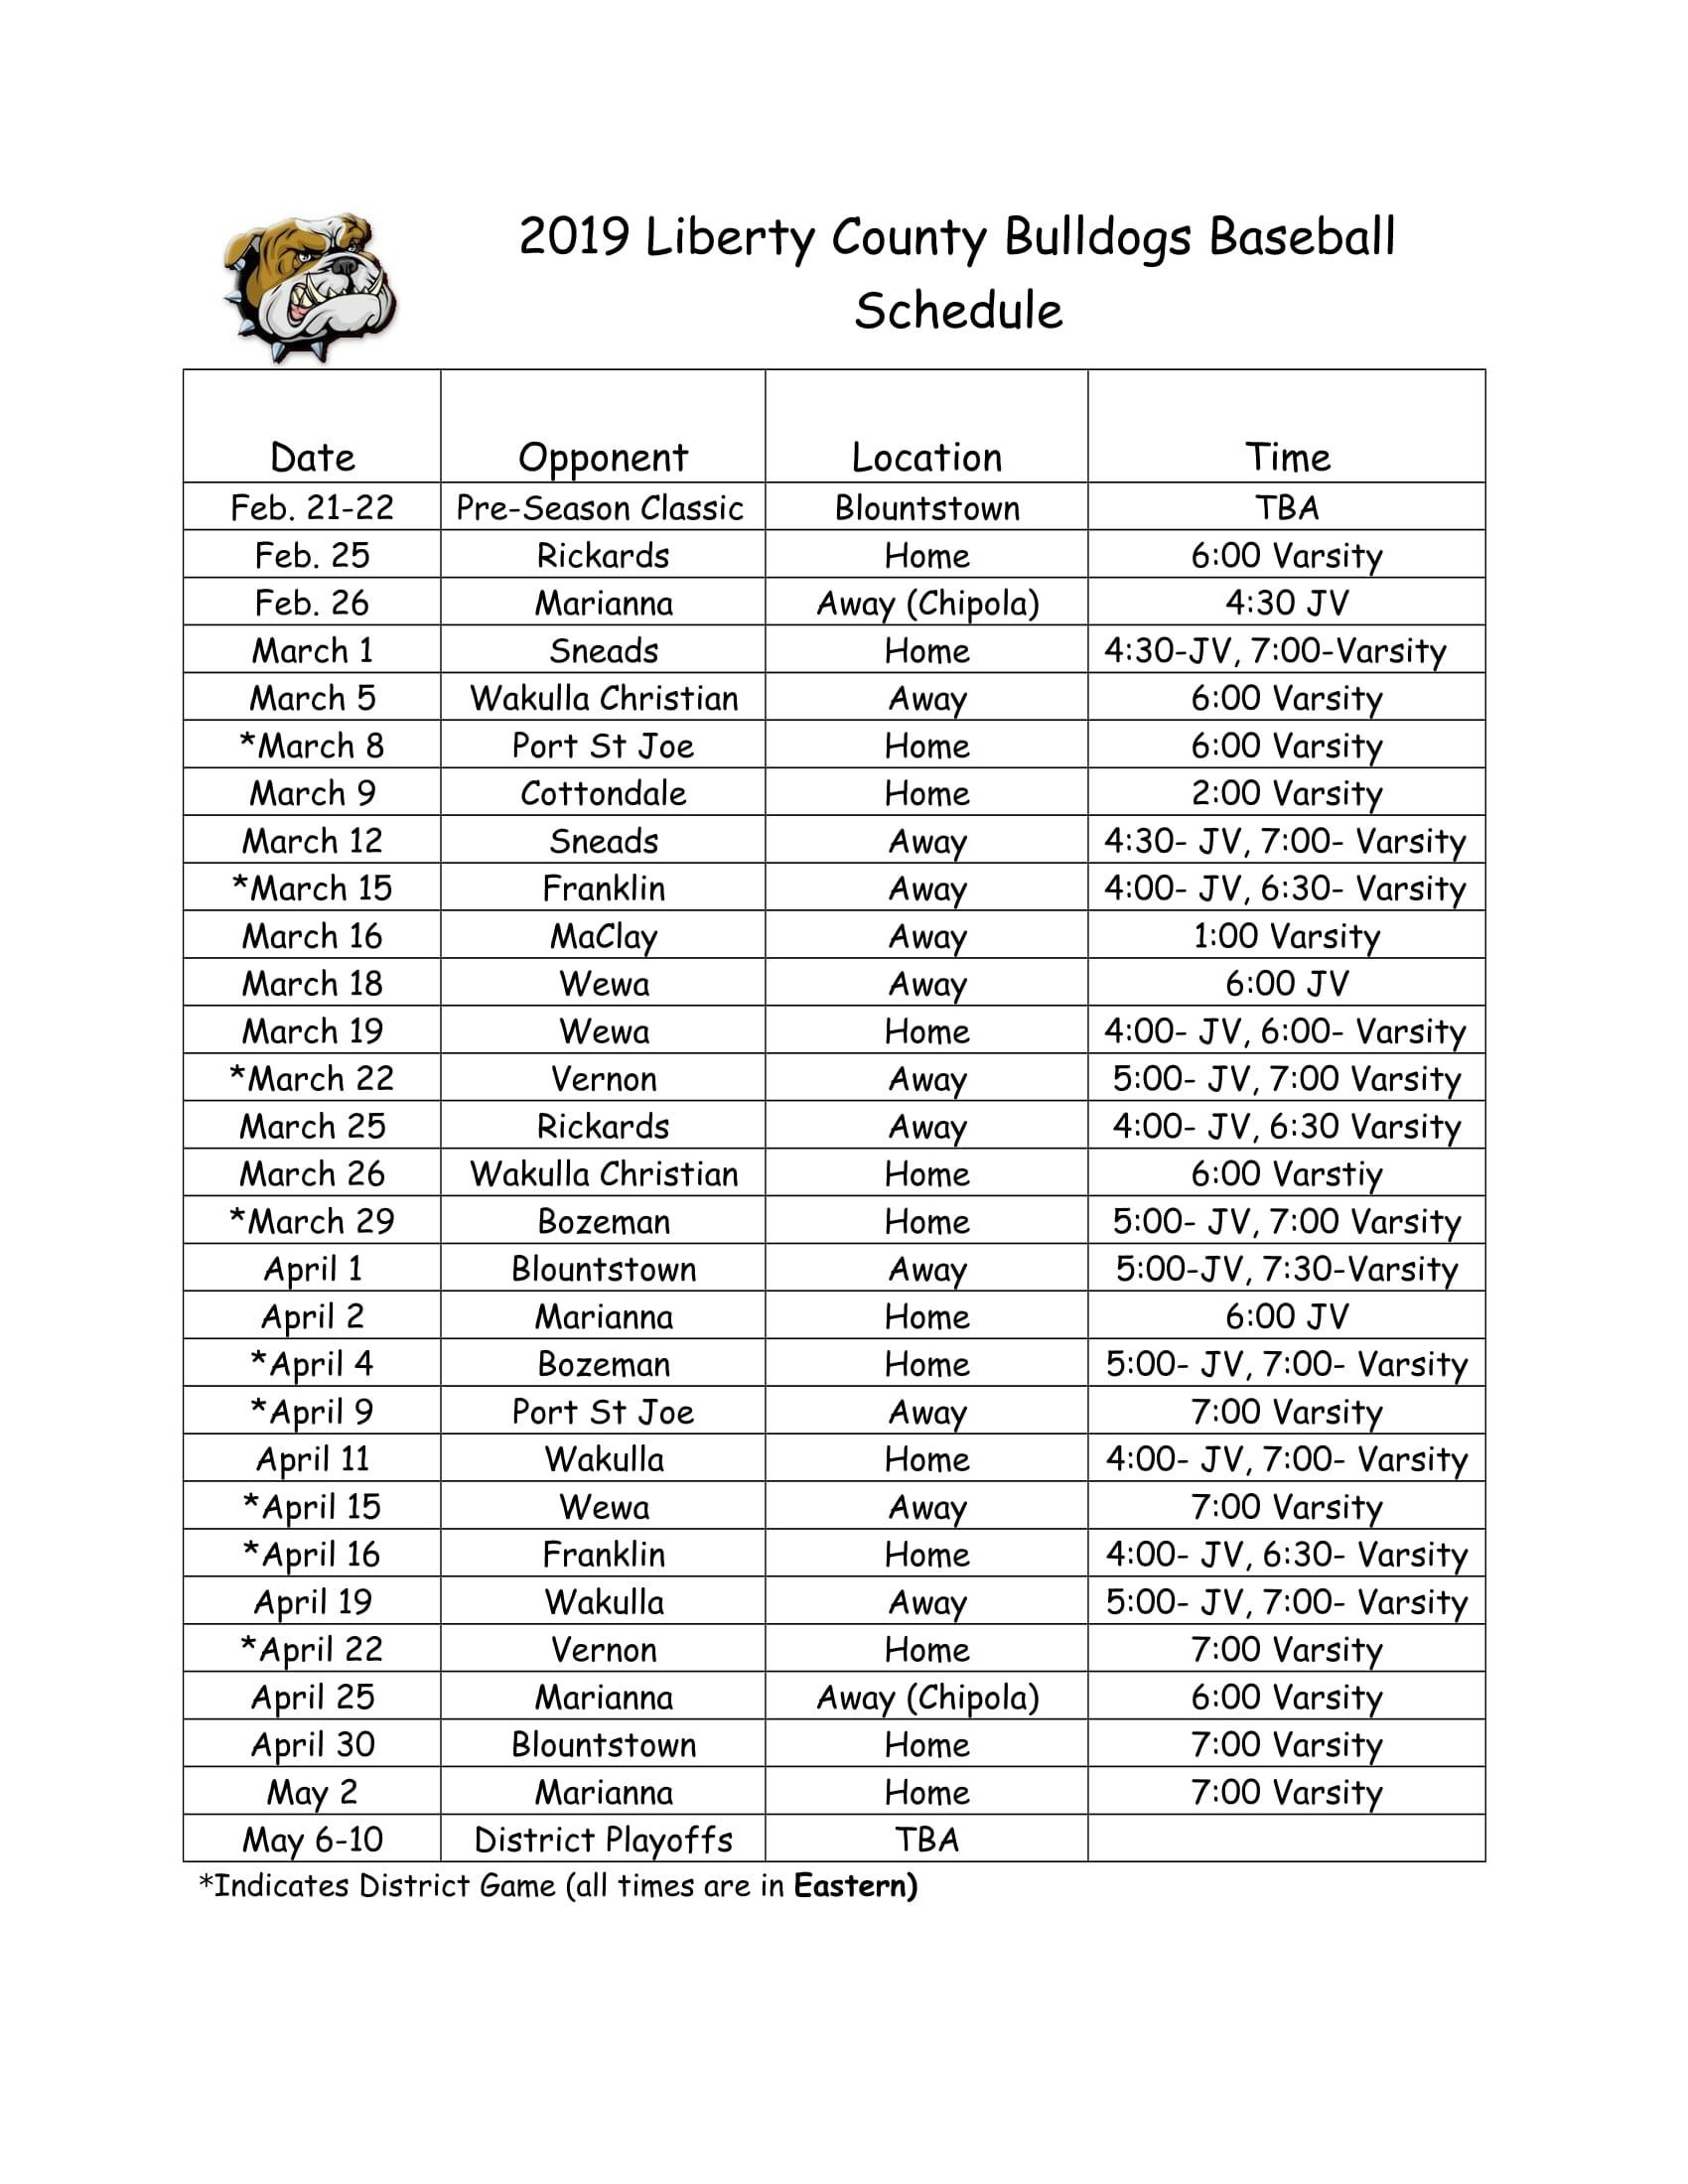 2019 Baseball Schedule